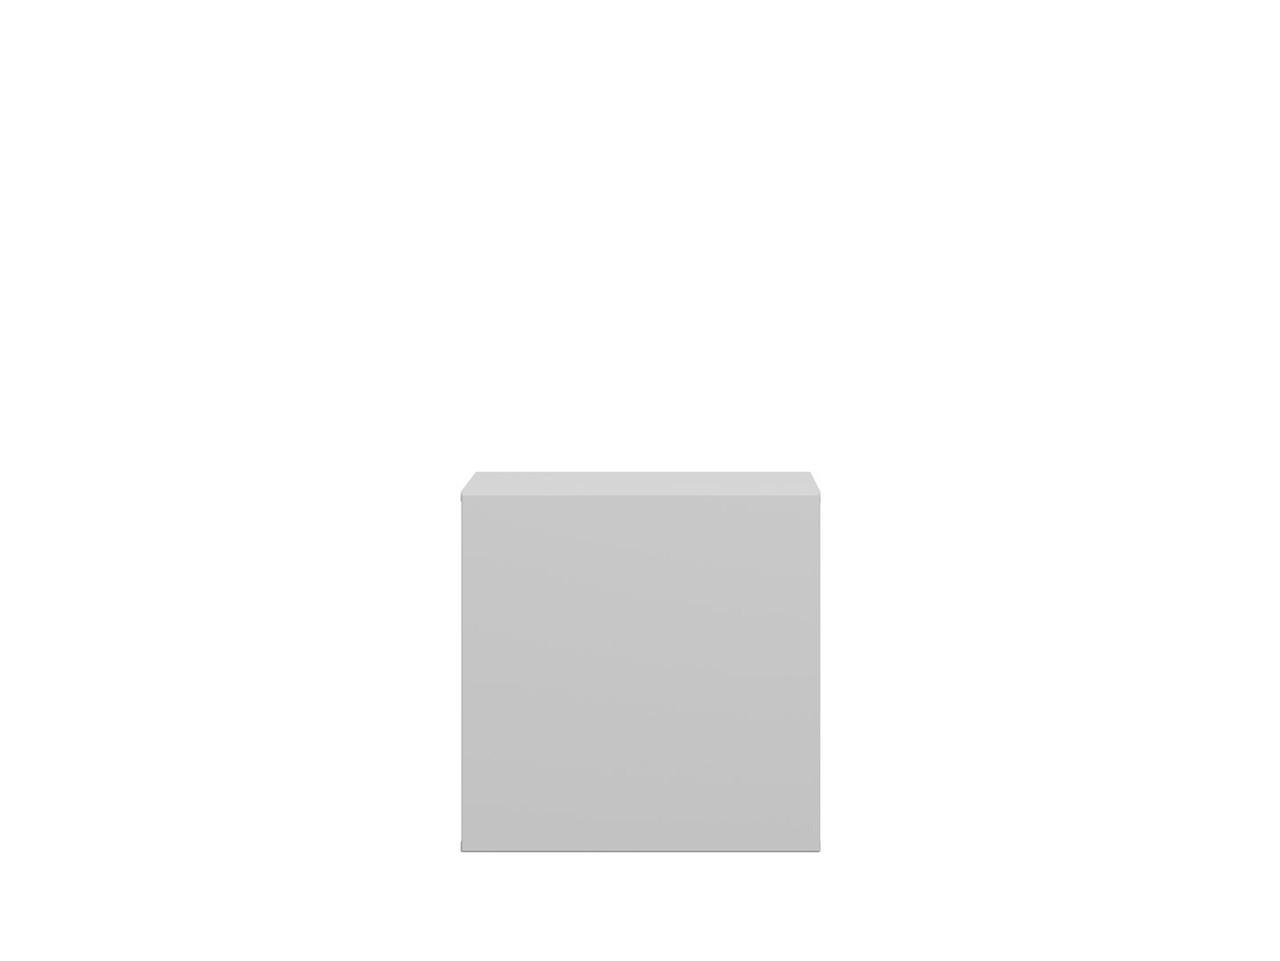 Комод Moko  moduł C lewy S259-SFW1D/6/6_L-JSZ/DANA/RAL7047 (BRW)